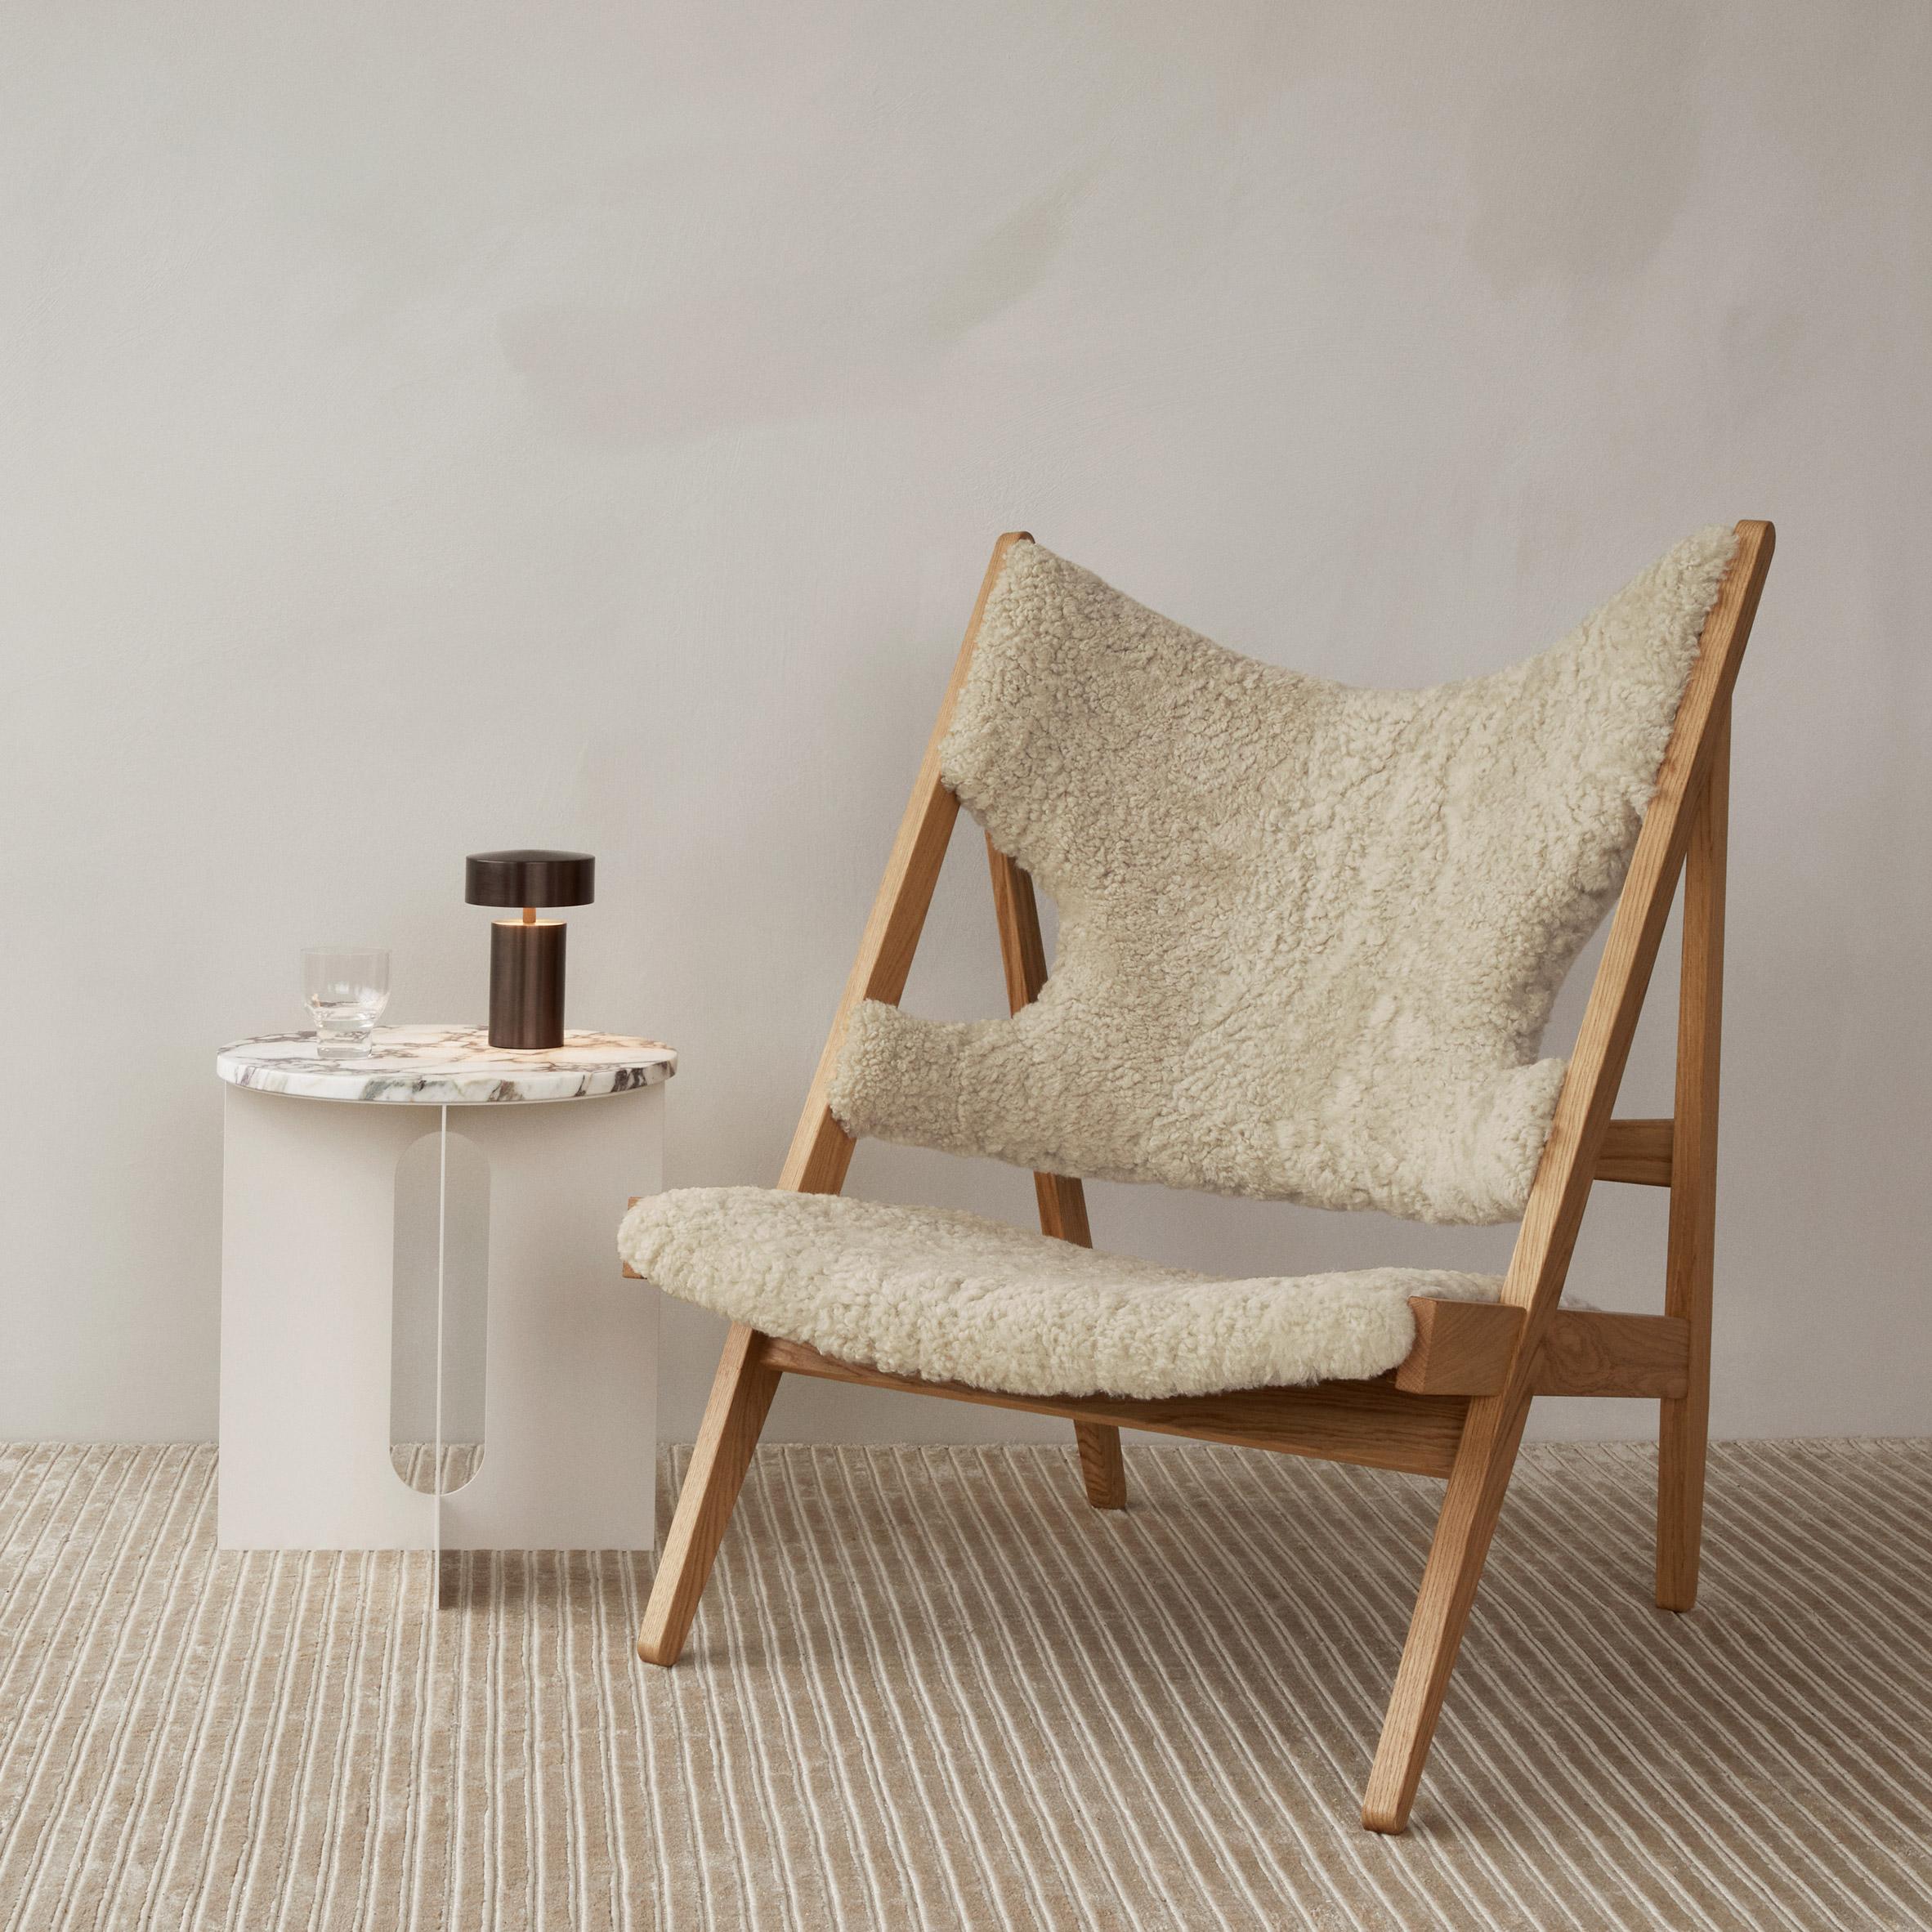 Knitting lounge chair by Ib Kofod-Larsen via Menu